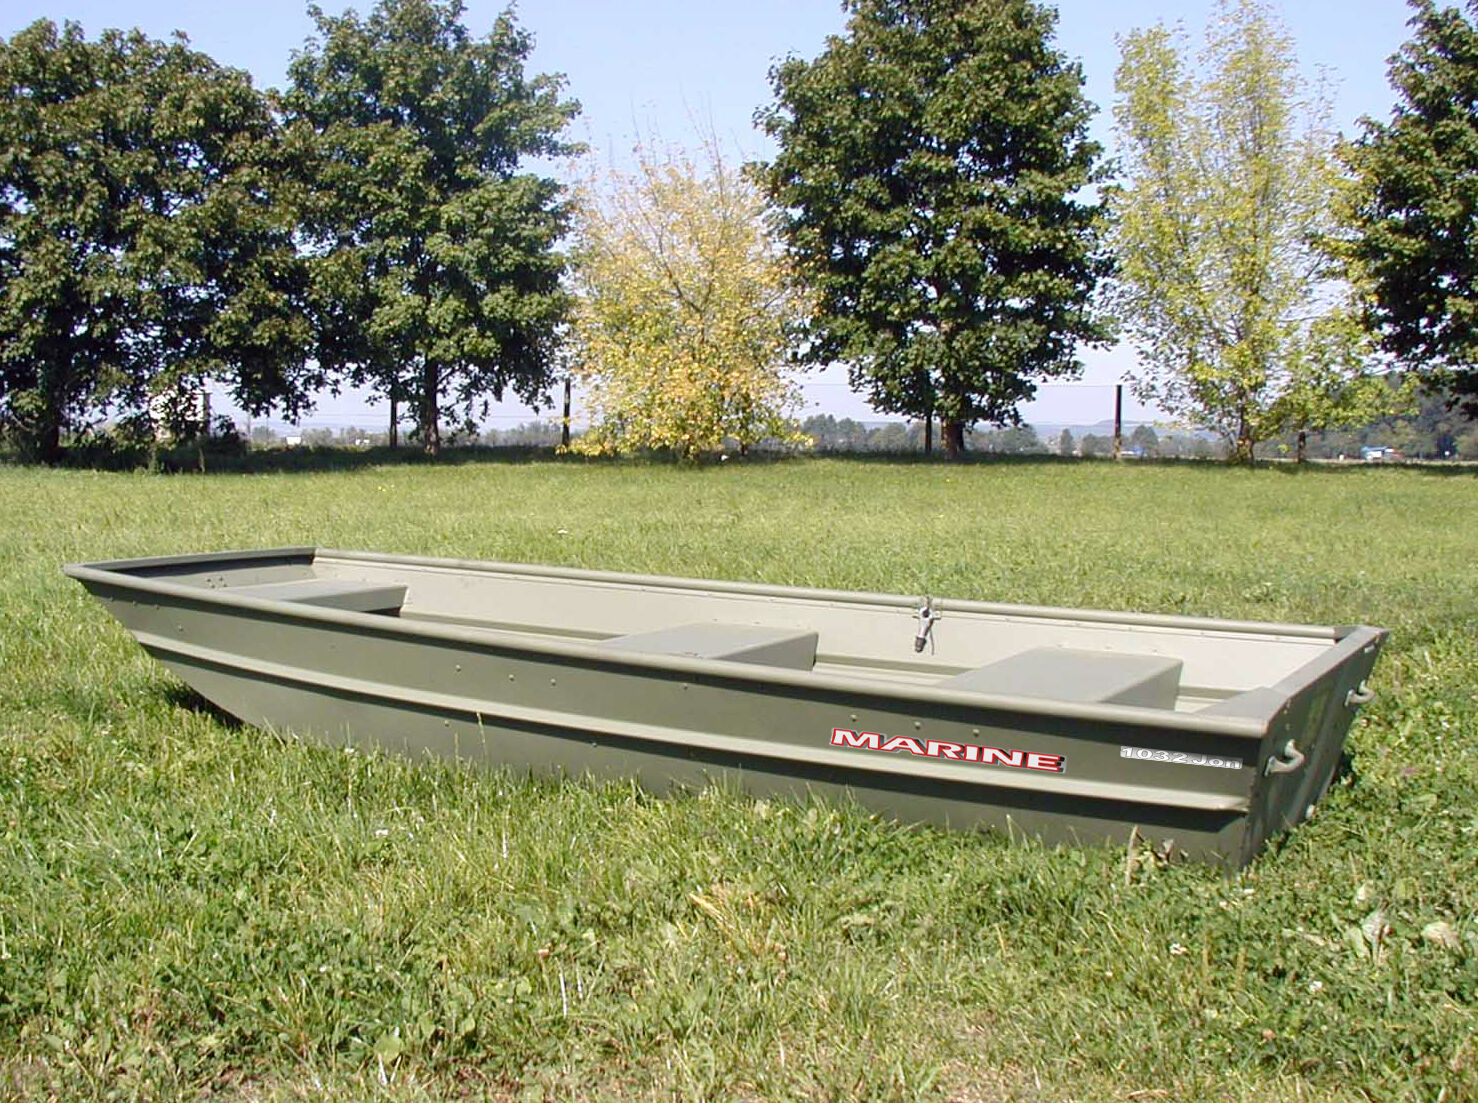 NEW Aluminium Marine Ally 10' Jon Dinghy Craft Row Boat Fishing ONLY 32Kgs GREEN